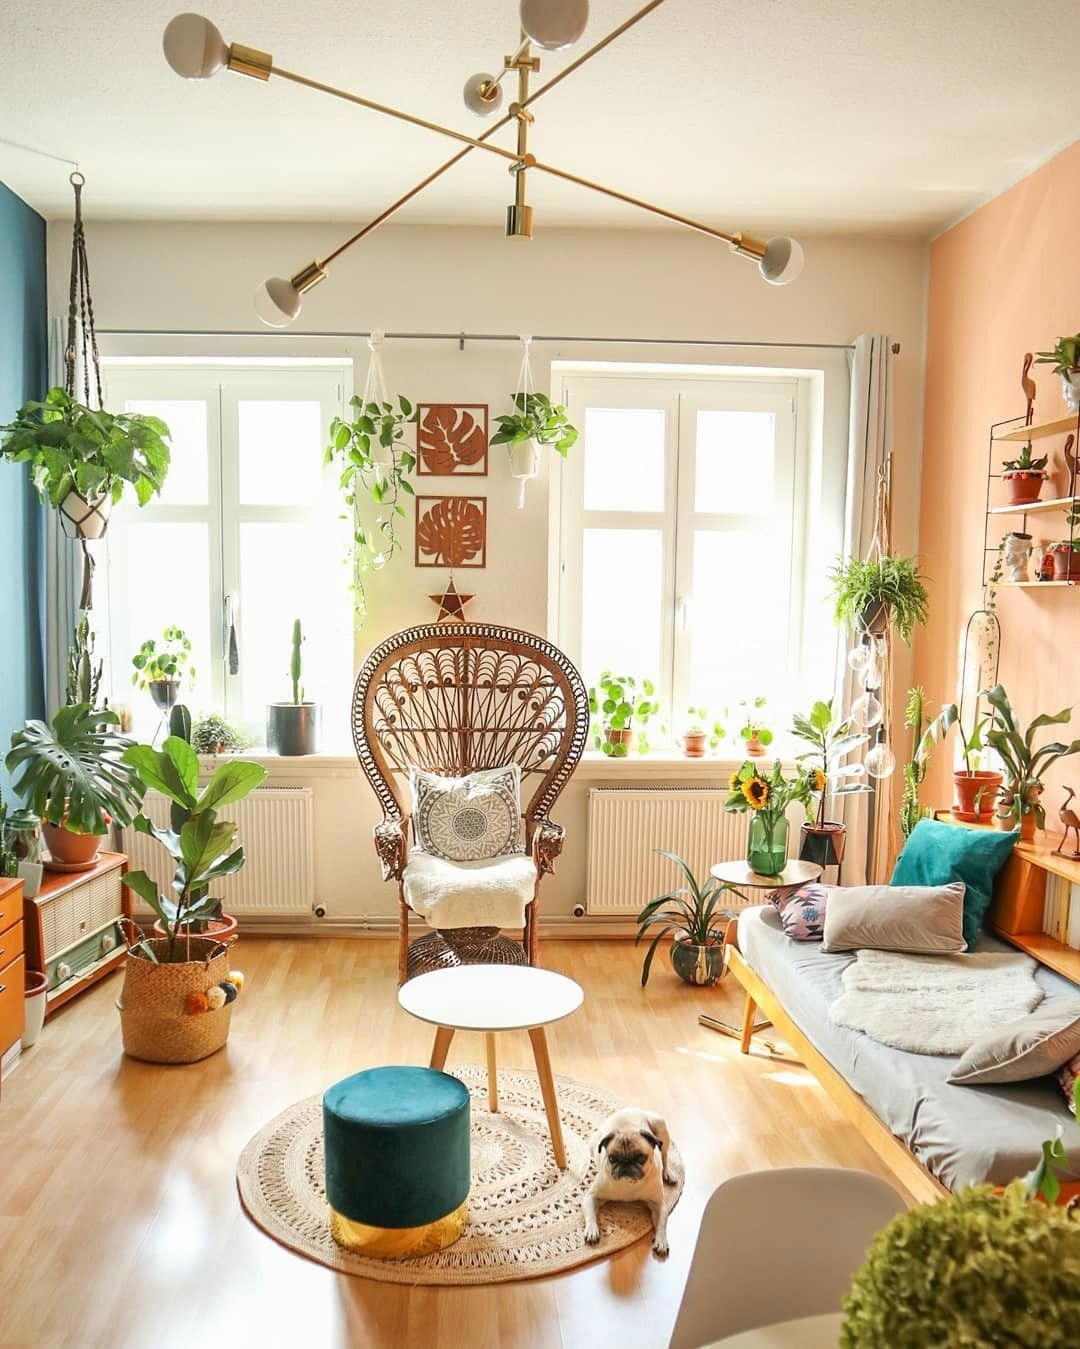 New Stylish Bohemian Home Decor and Design Ideas #BedroomDecor